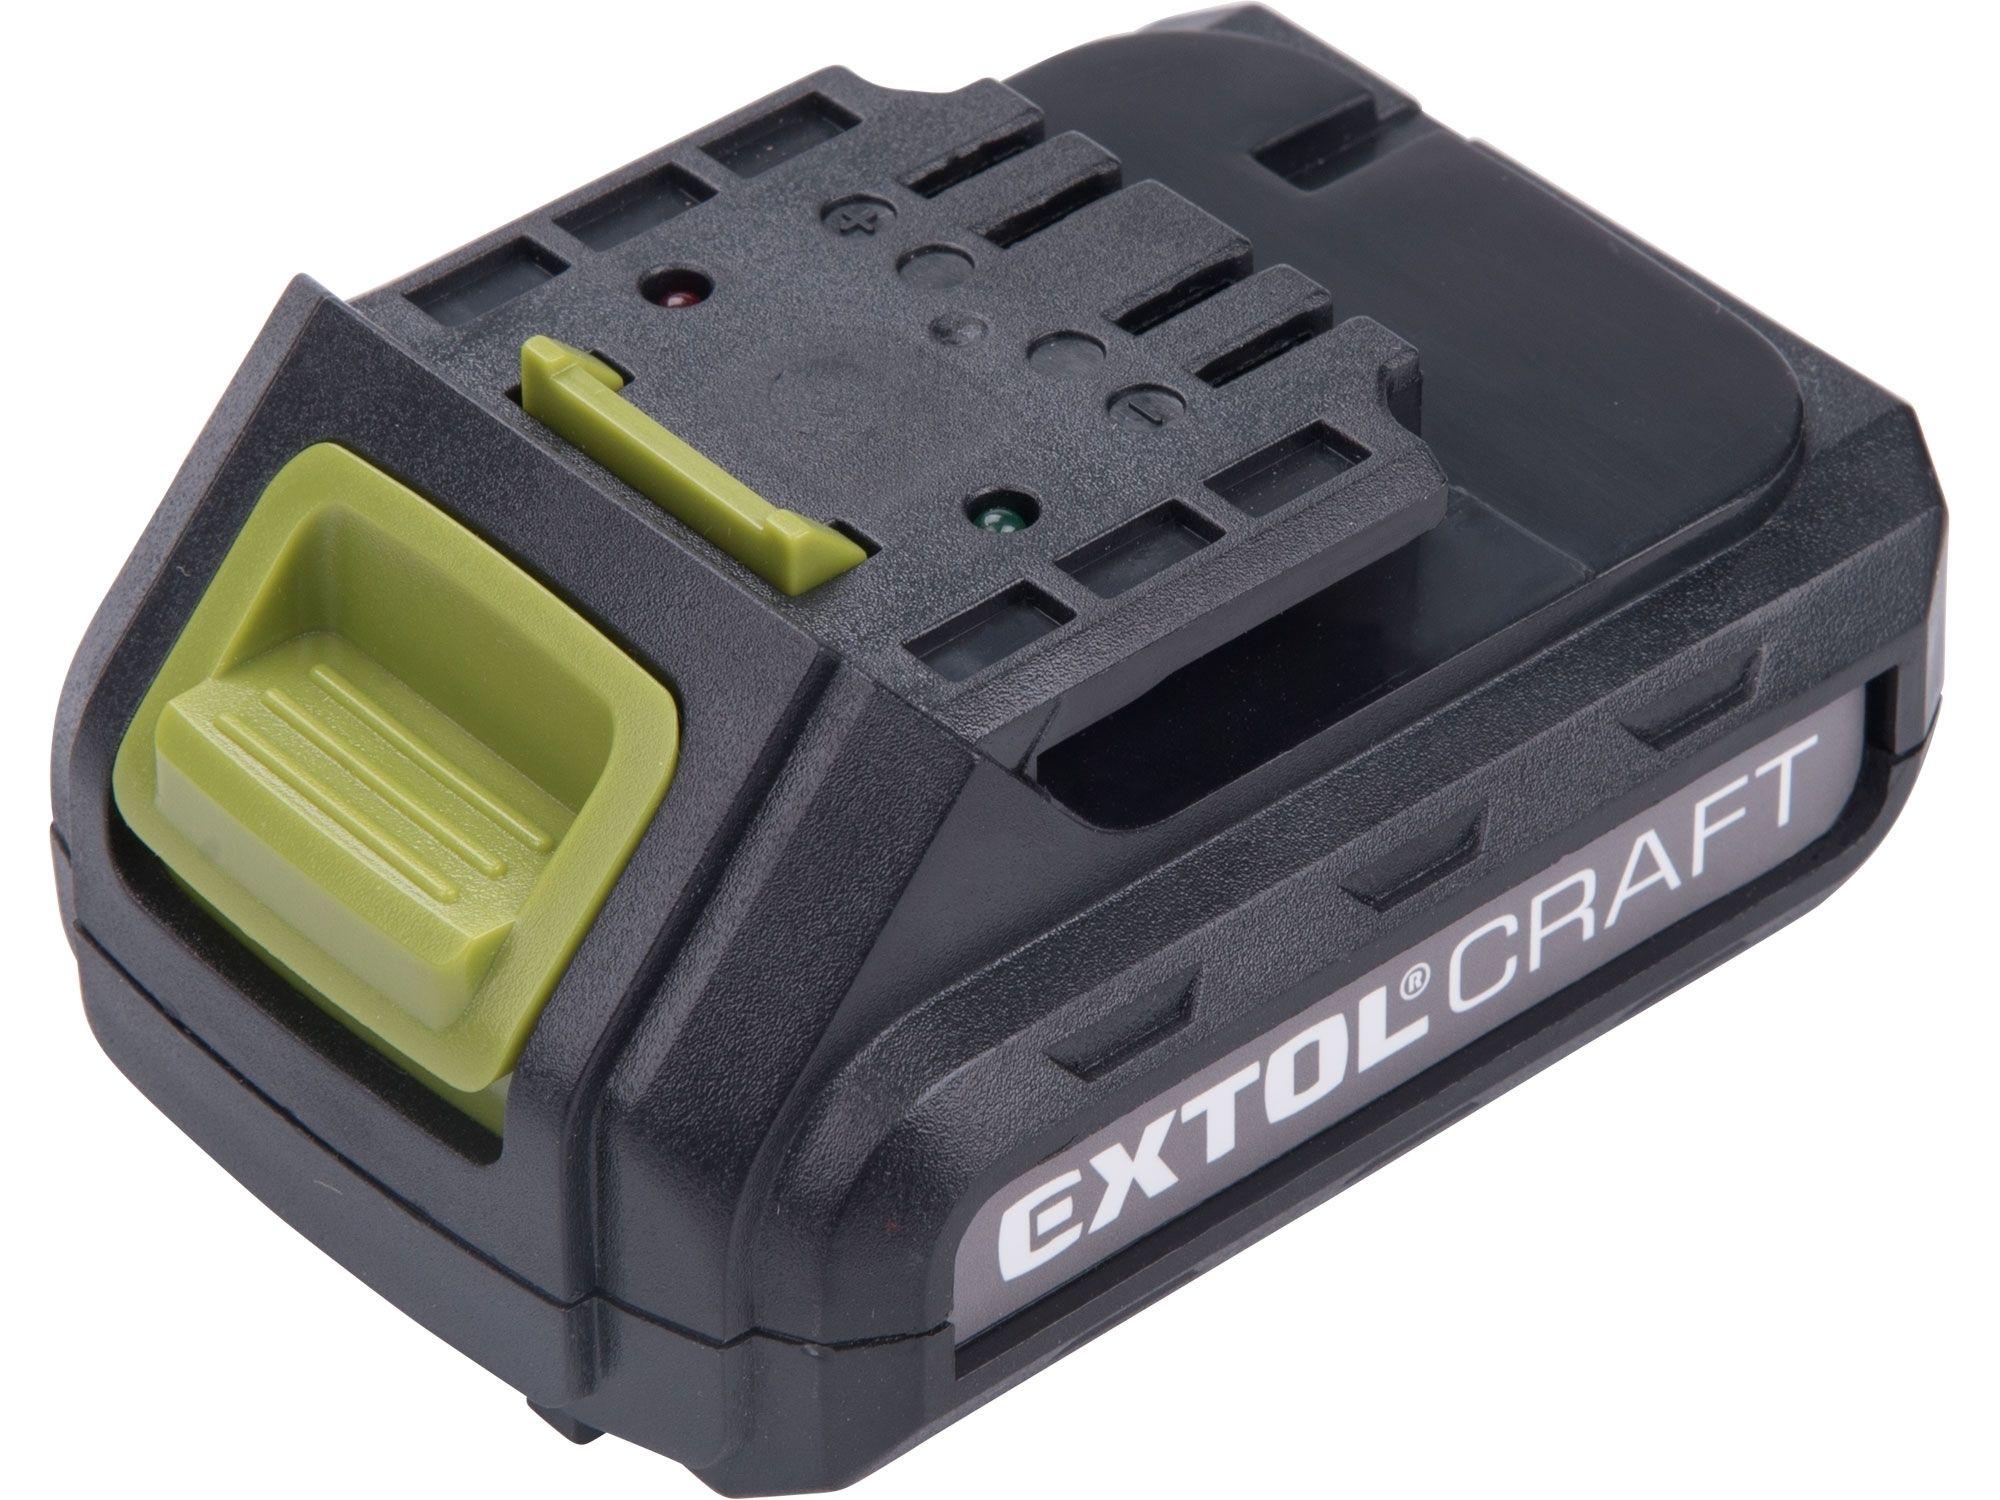 Baterie akumulátorová, 12V Li-ion, 1300mAh, pro 402400 EXTOL-CRAFT